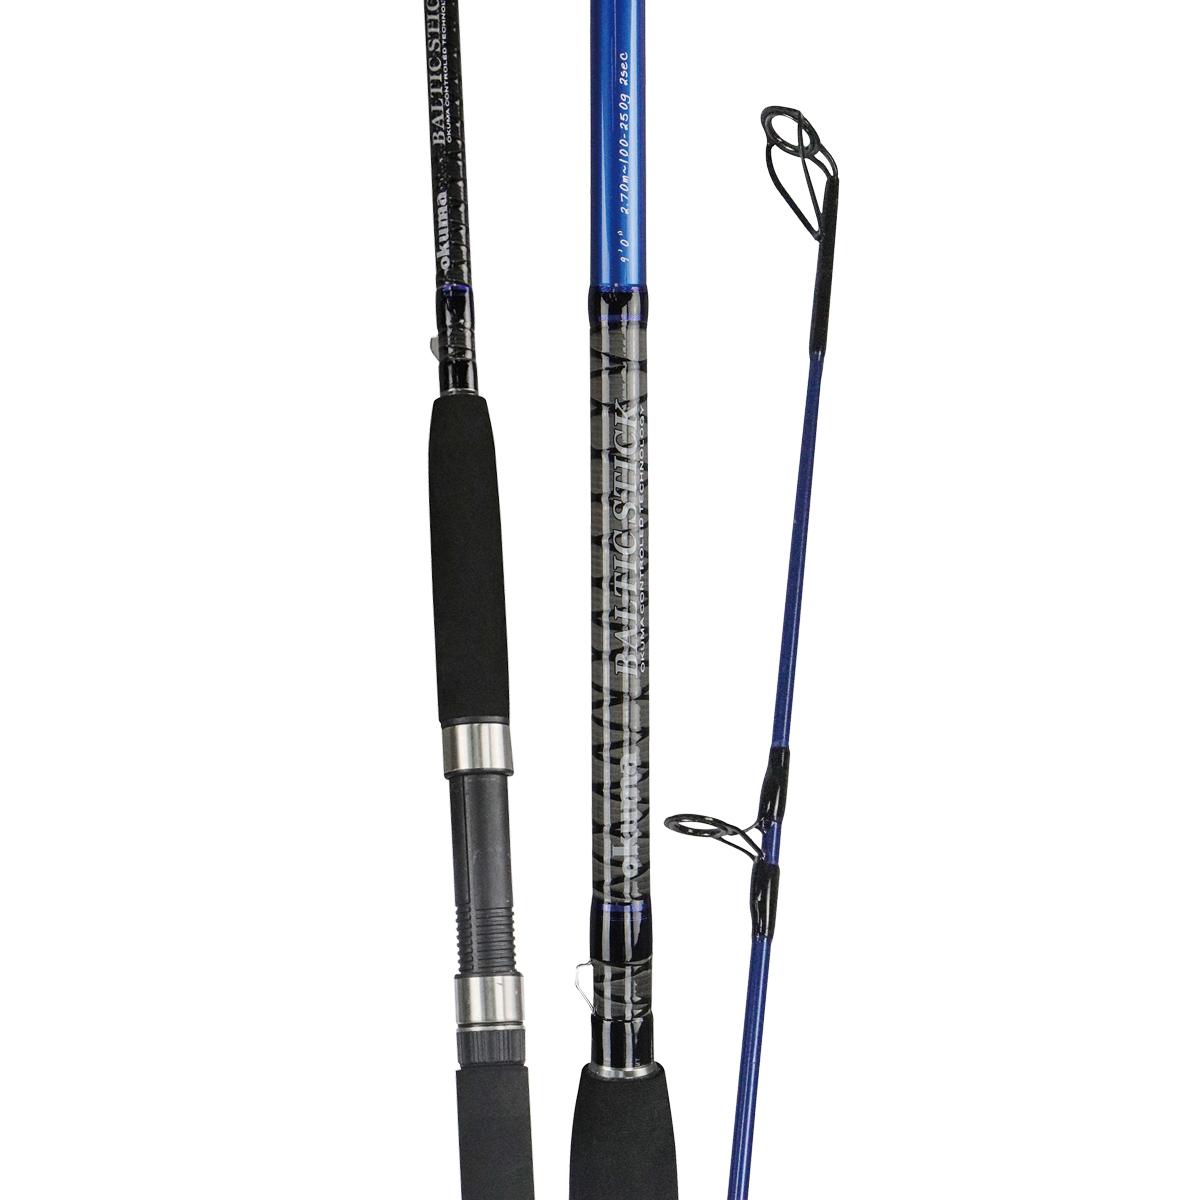 Baltic Stick Rod - Okuma Baltic Stick Rod-For freshwater fishing- High modulus ultra-responsive carbon blank construction- Zirconium guides inserts reduce friction-Quality Okuma graphite reel seat